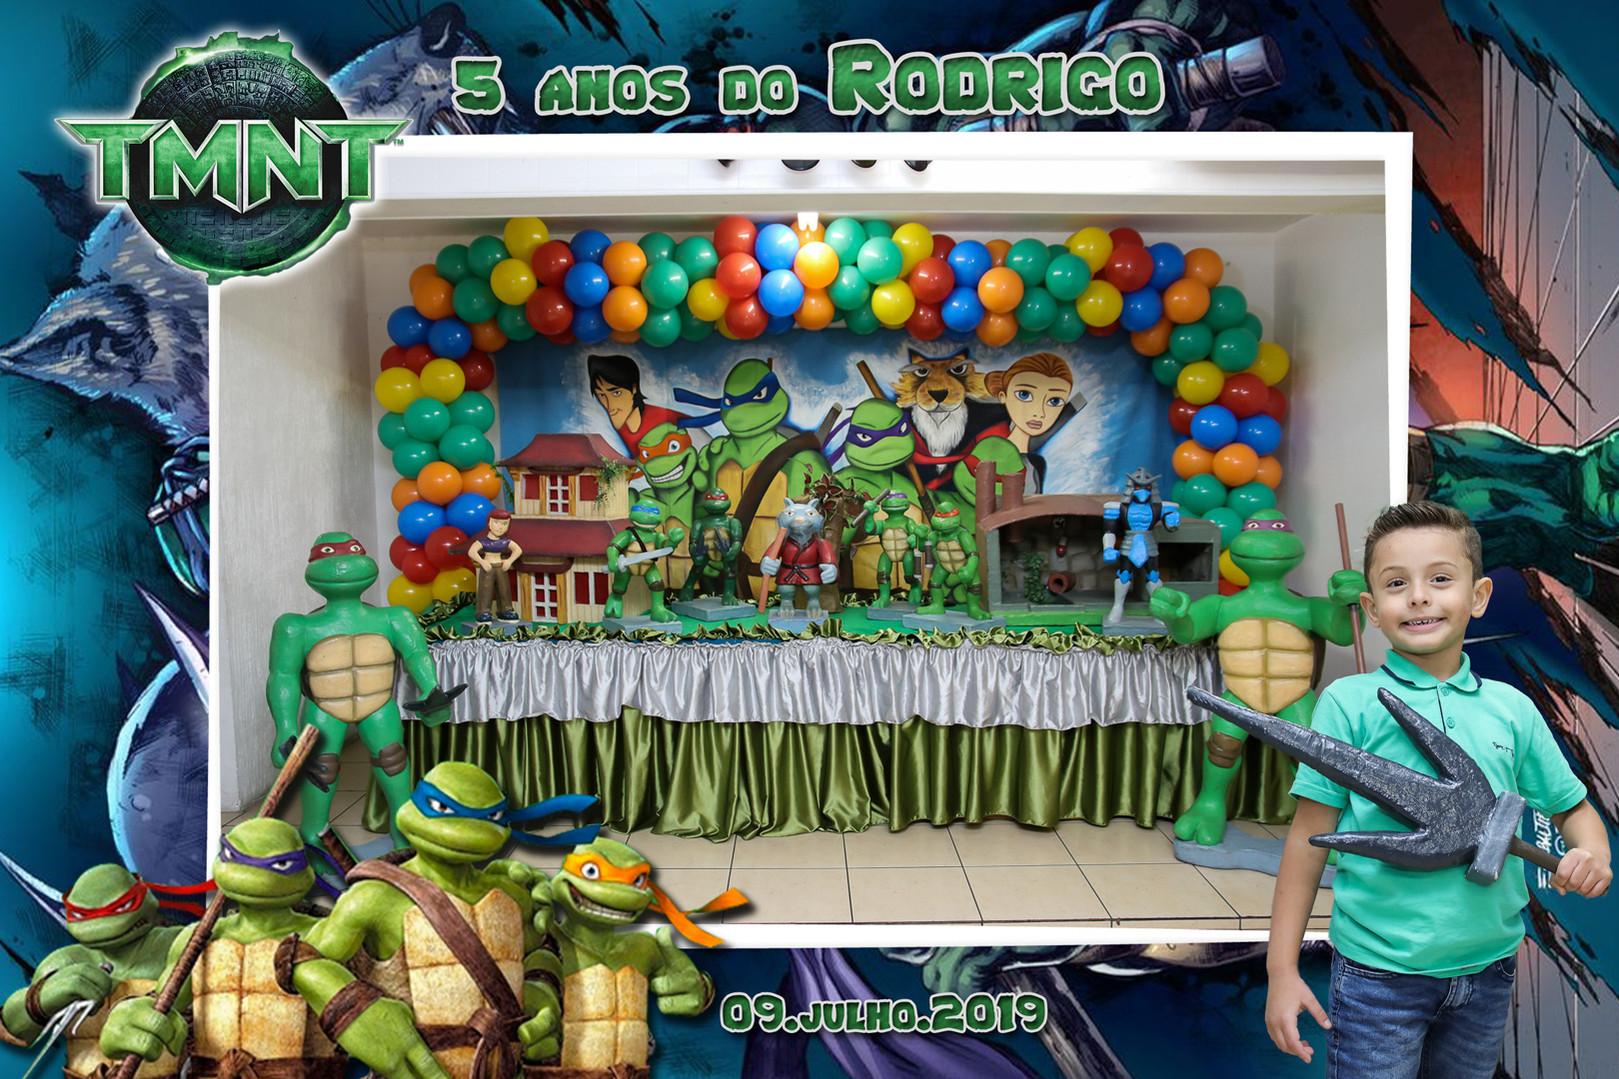 Rodrigo 5 anos (1).jpg